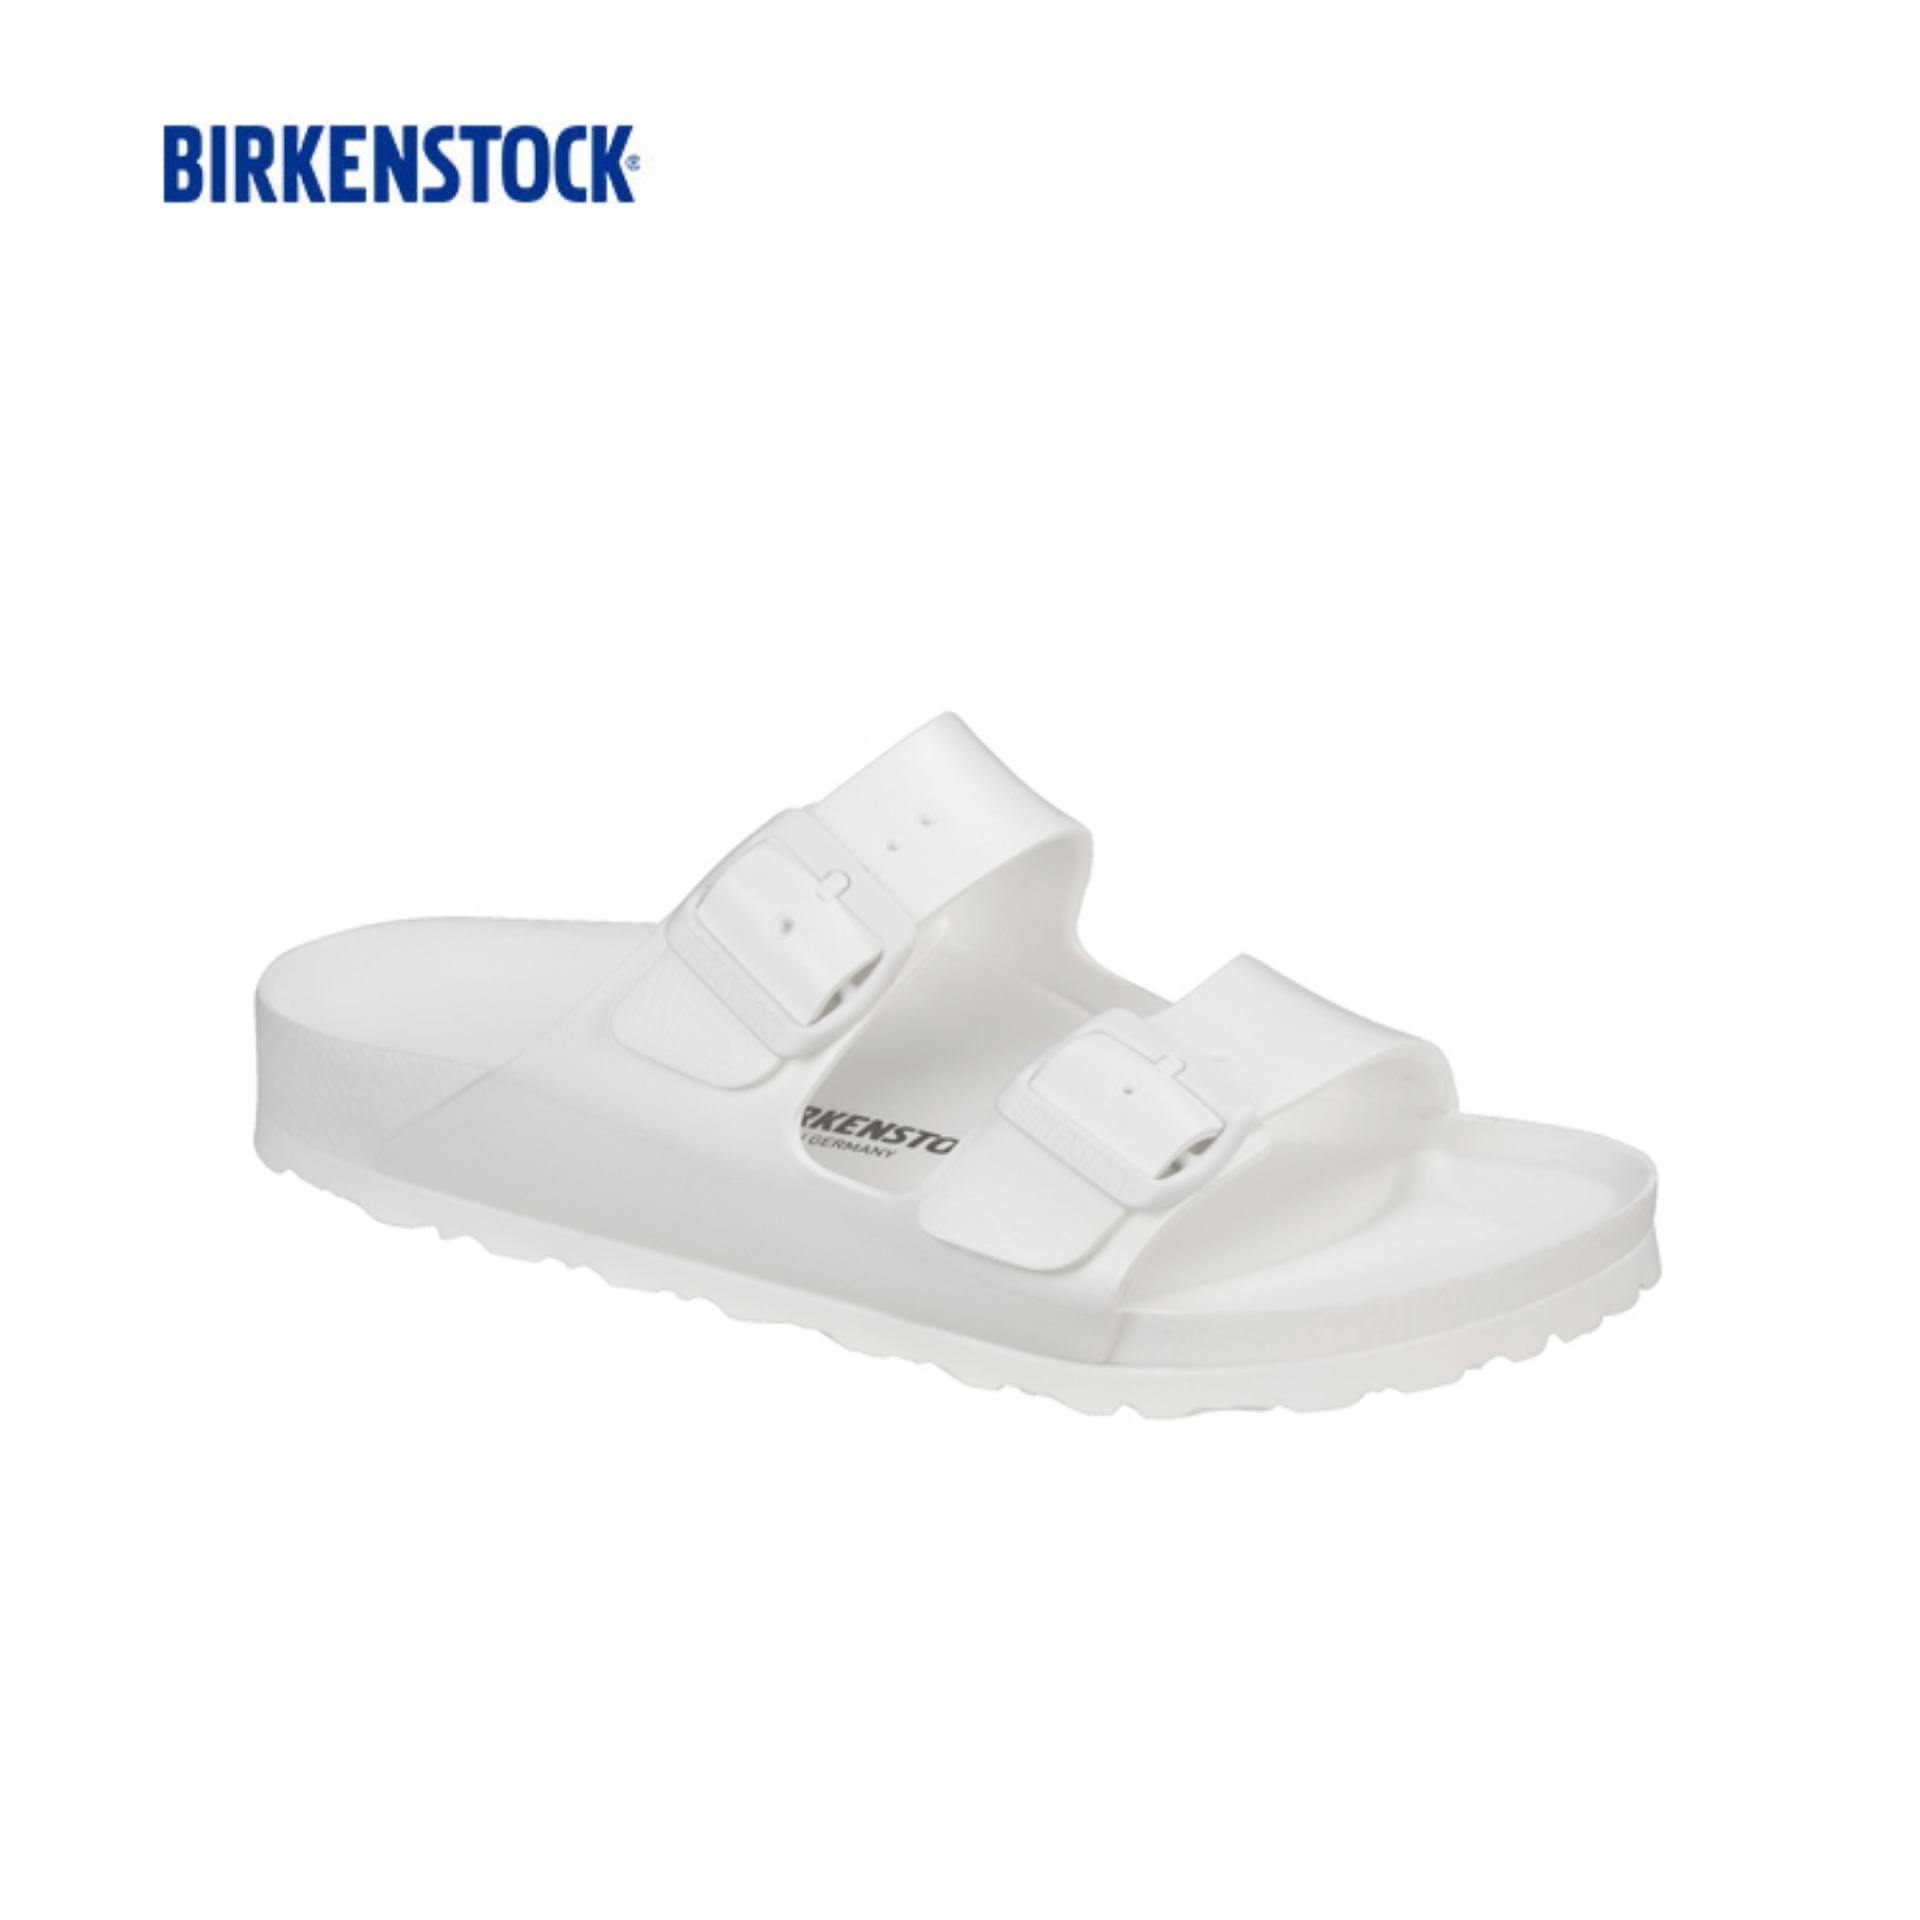 plain white birkenstocks off 60% - www